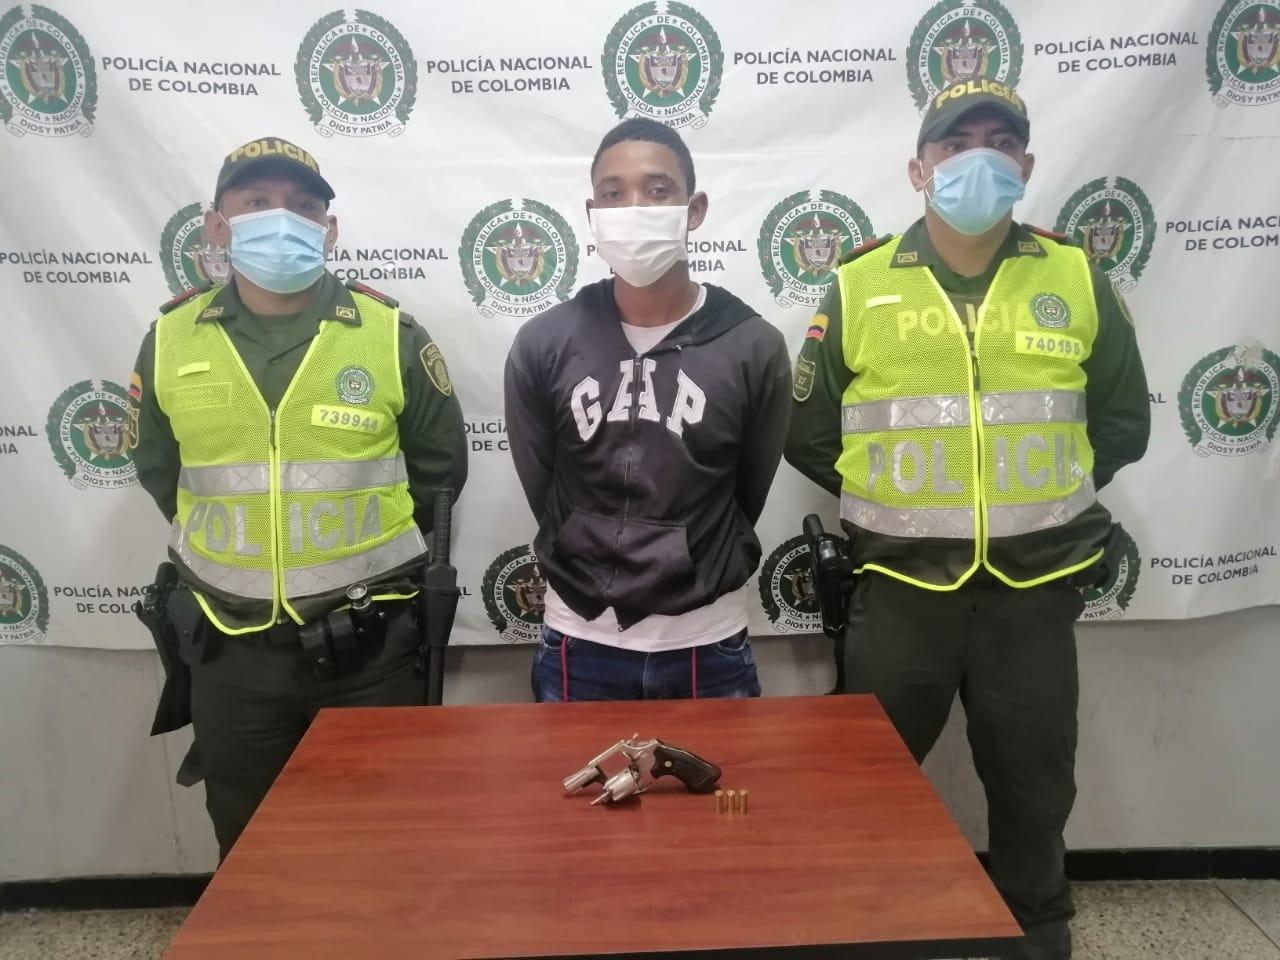 https://www.notasrosas.com/Setra captura tres personas en Riohacha por diferentes delitos